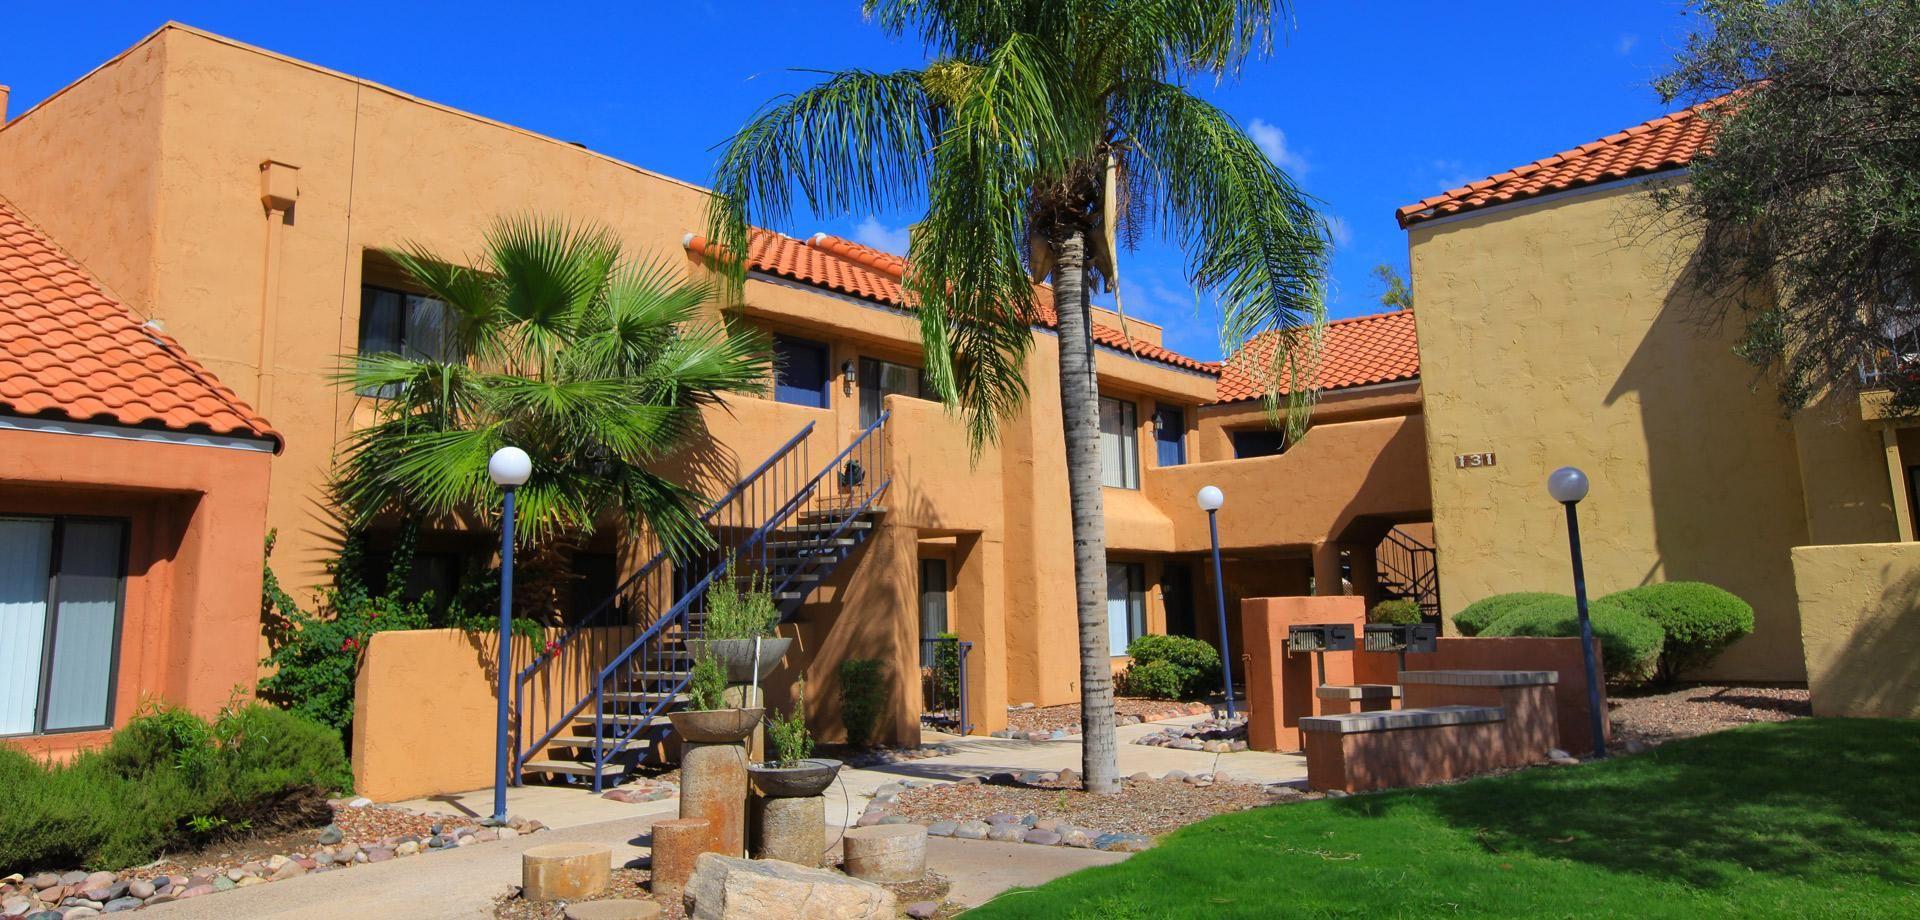 Rio Cancion Apartment Homes Tucson Arizona Unique Floor Plans Resort Style Arizona